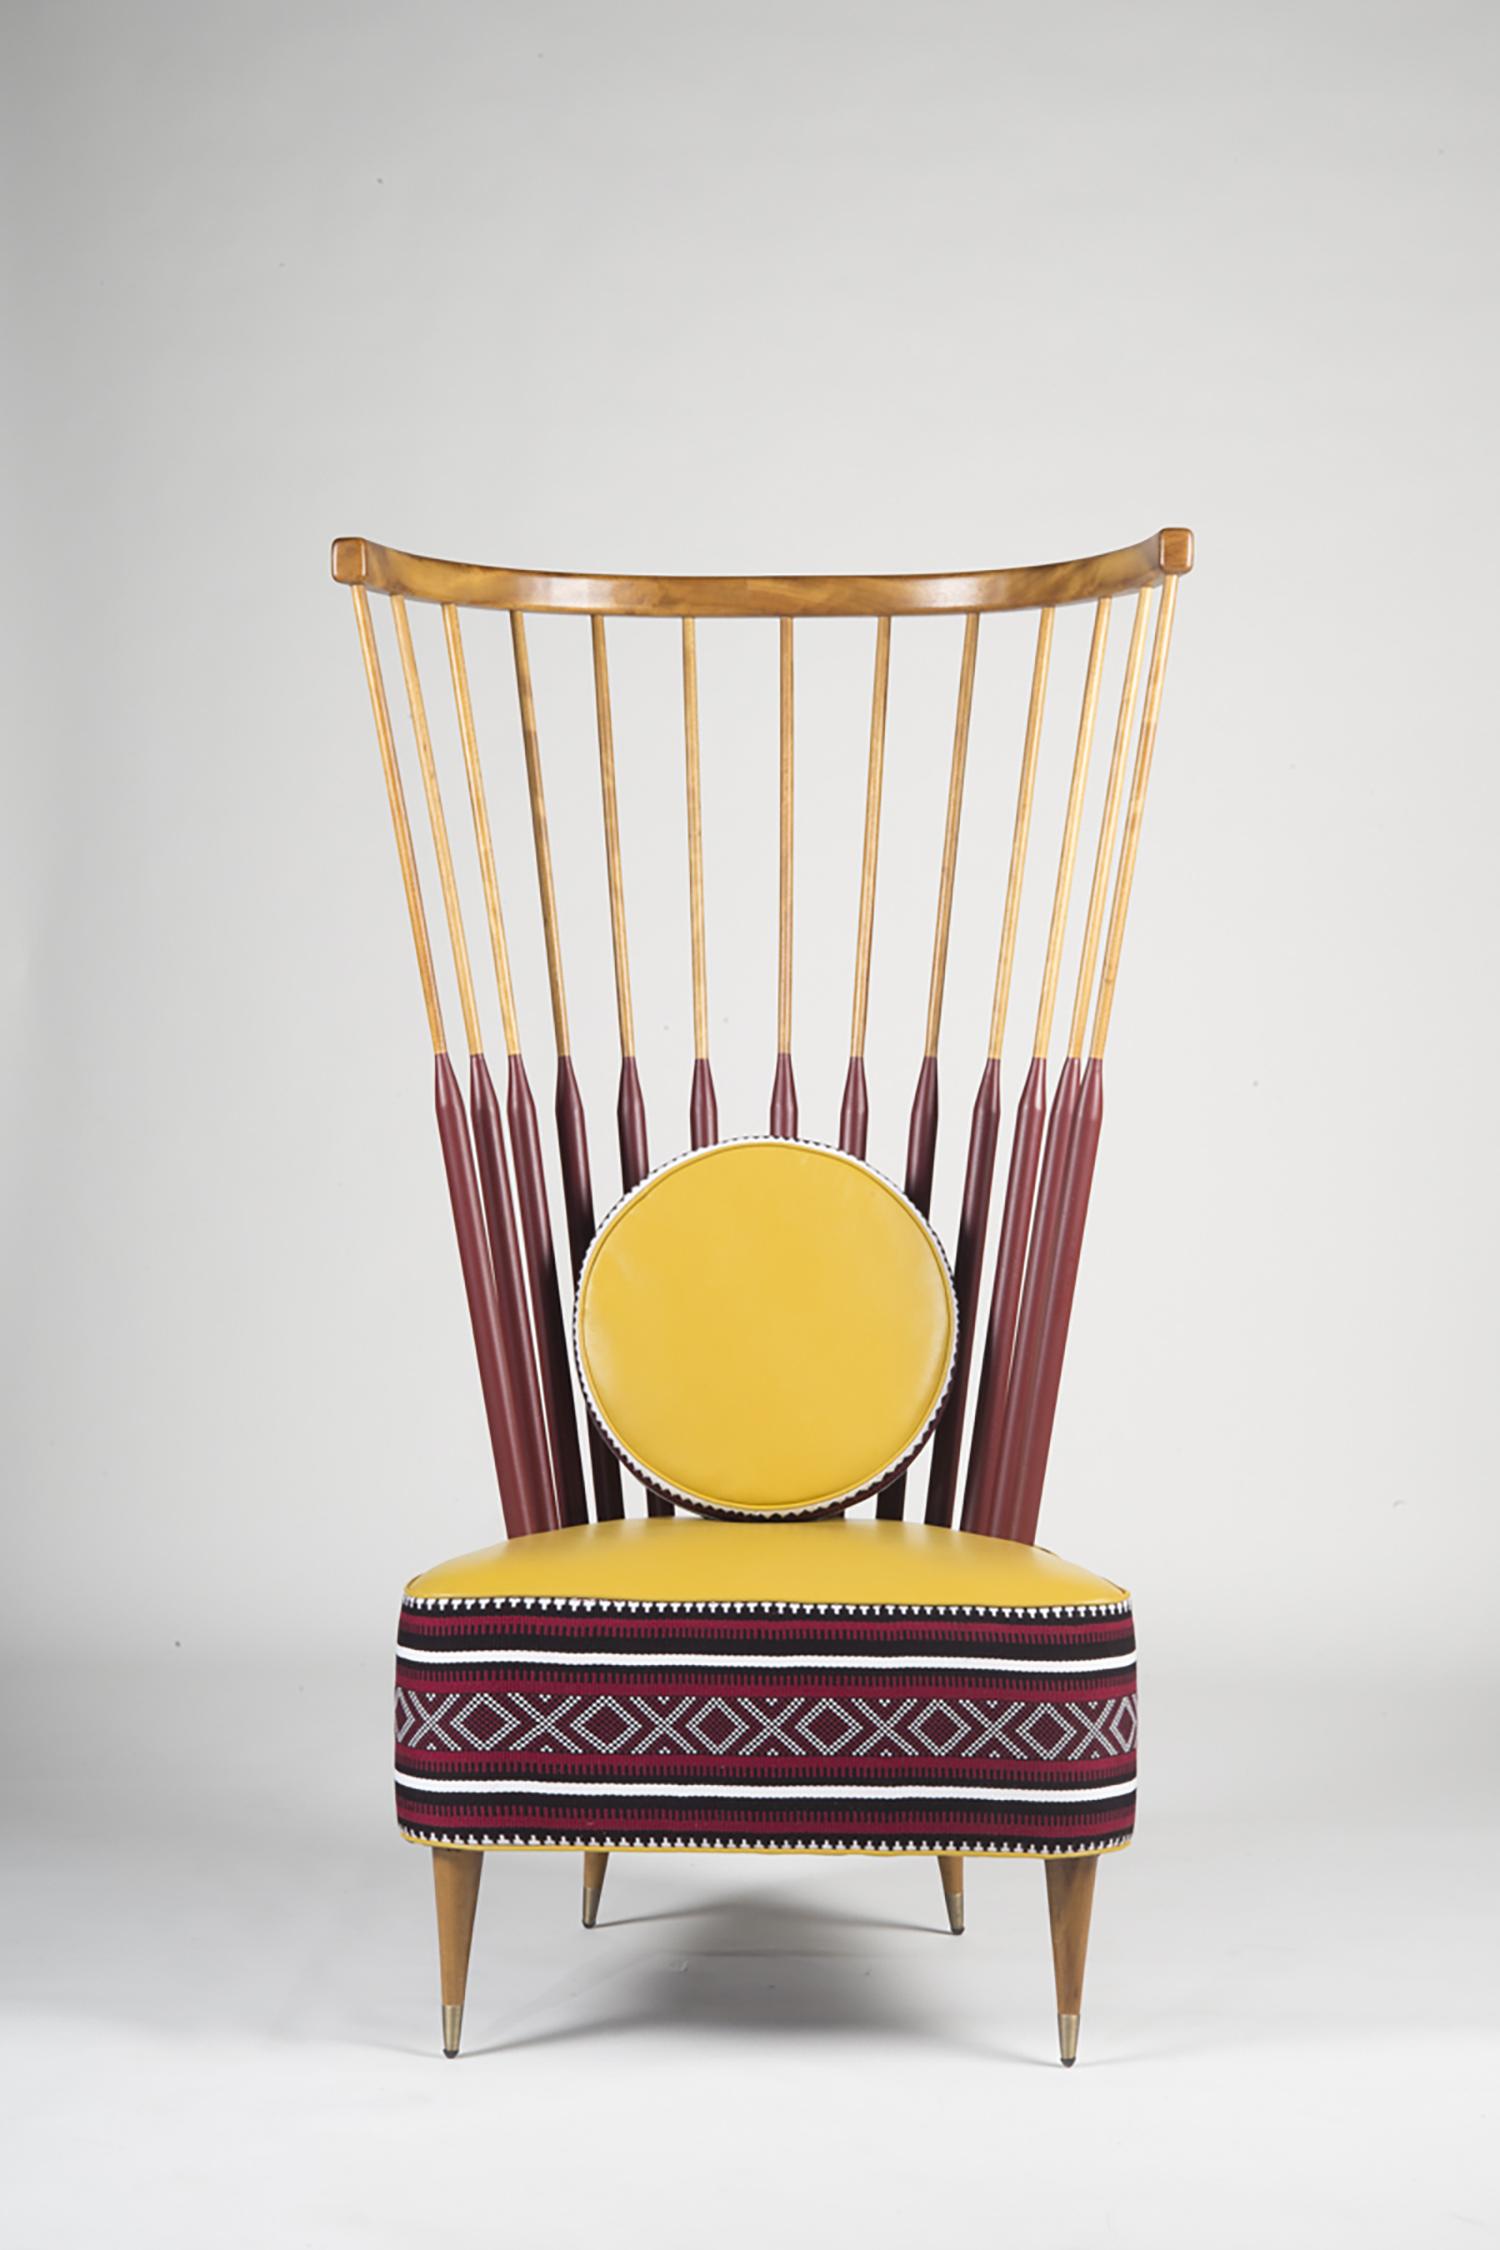 Studio MUJU -Moza Chair 1.jpg